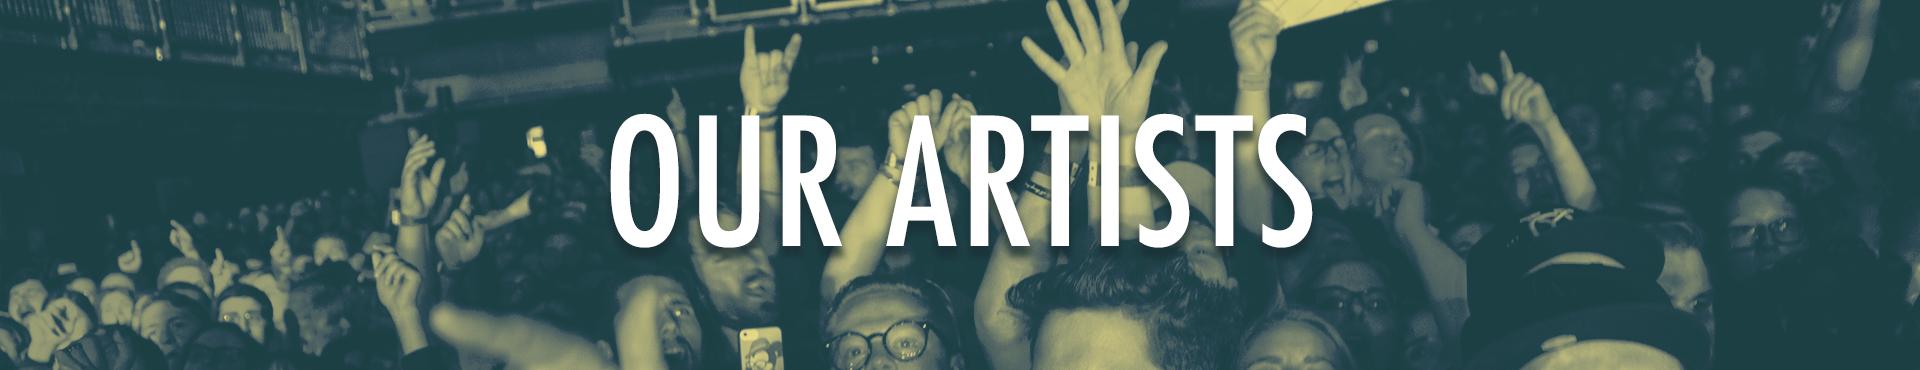 hopeless_web_banners-head_our artists 2B.jpg